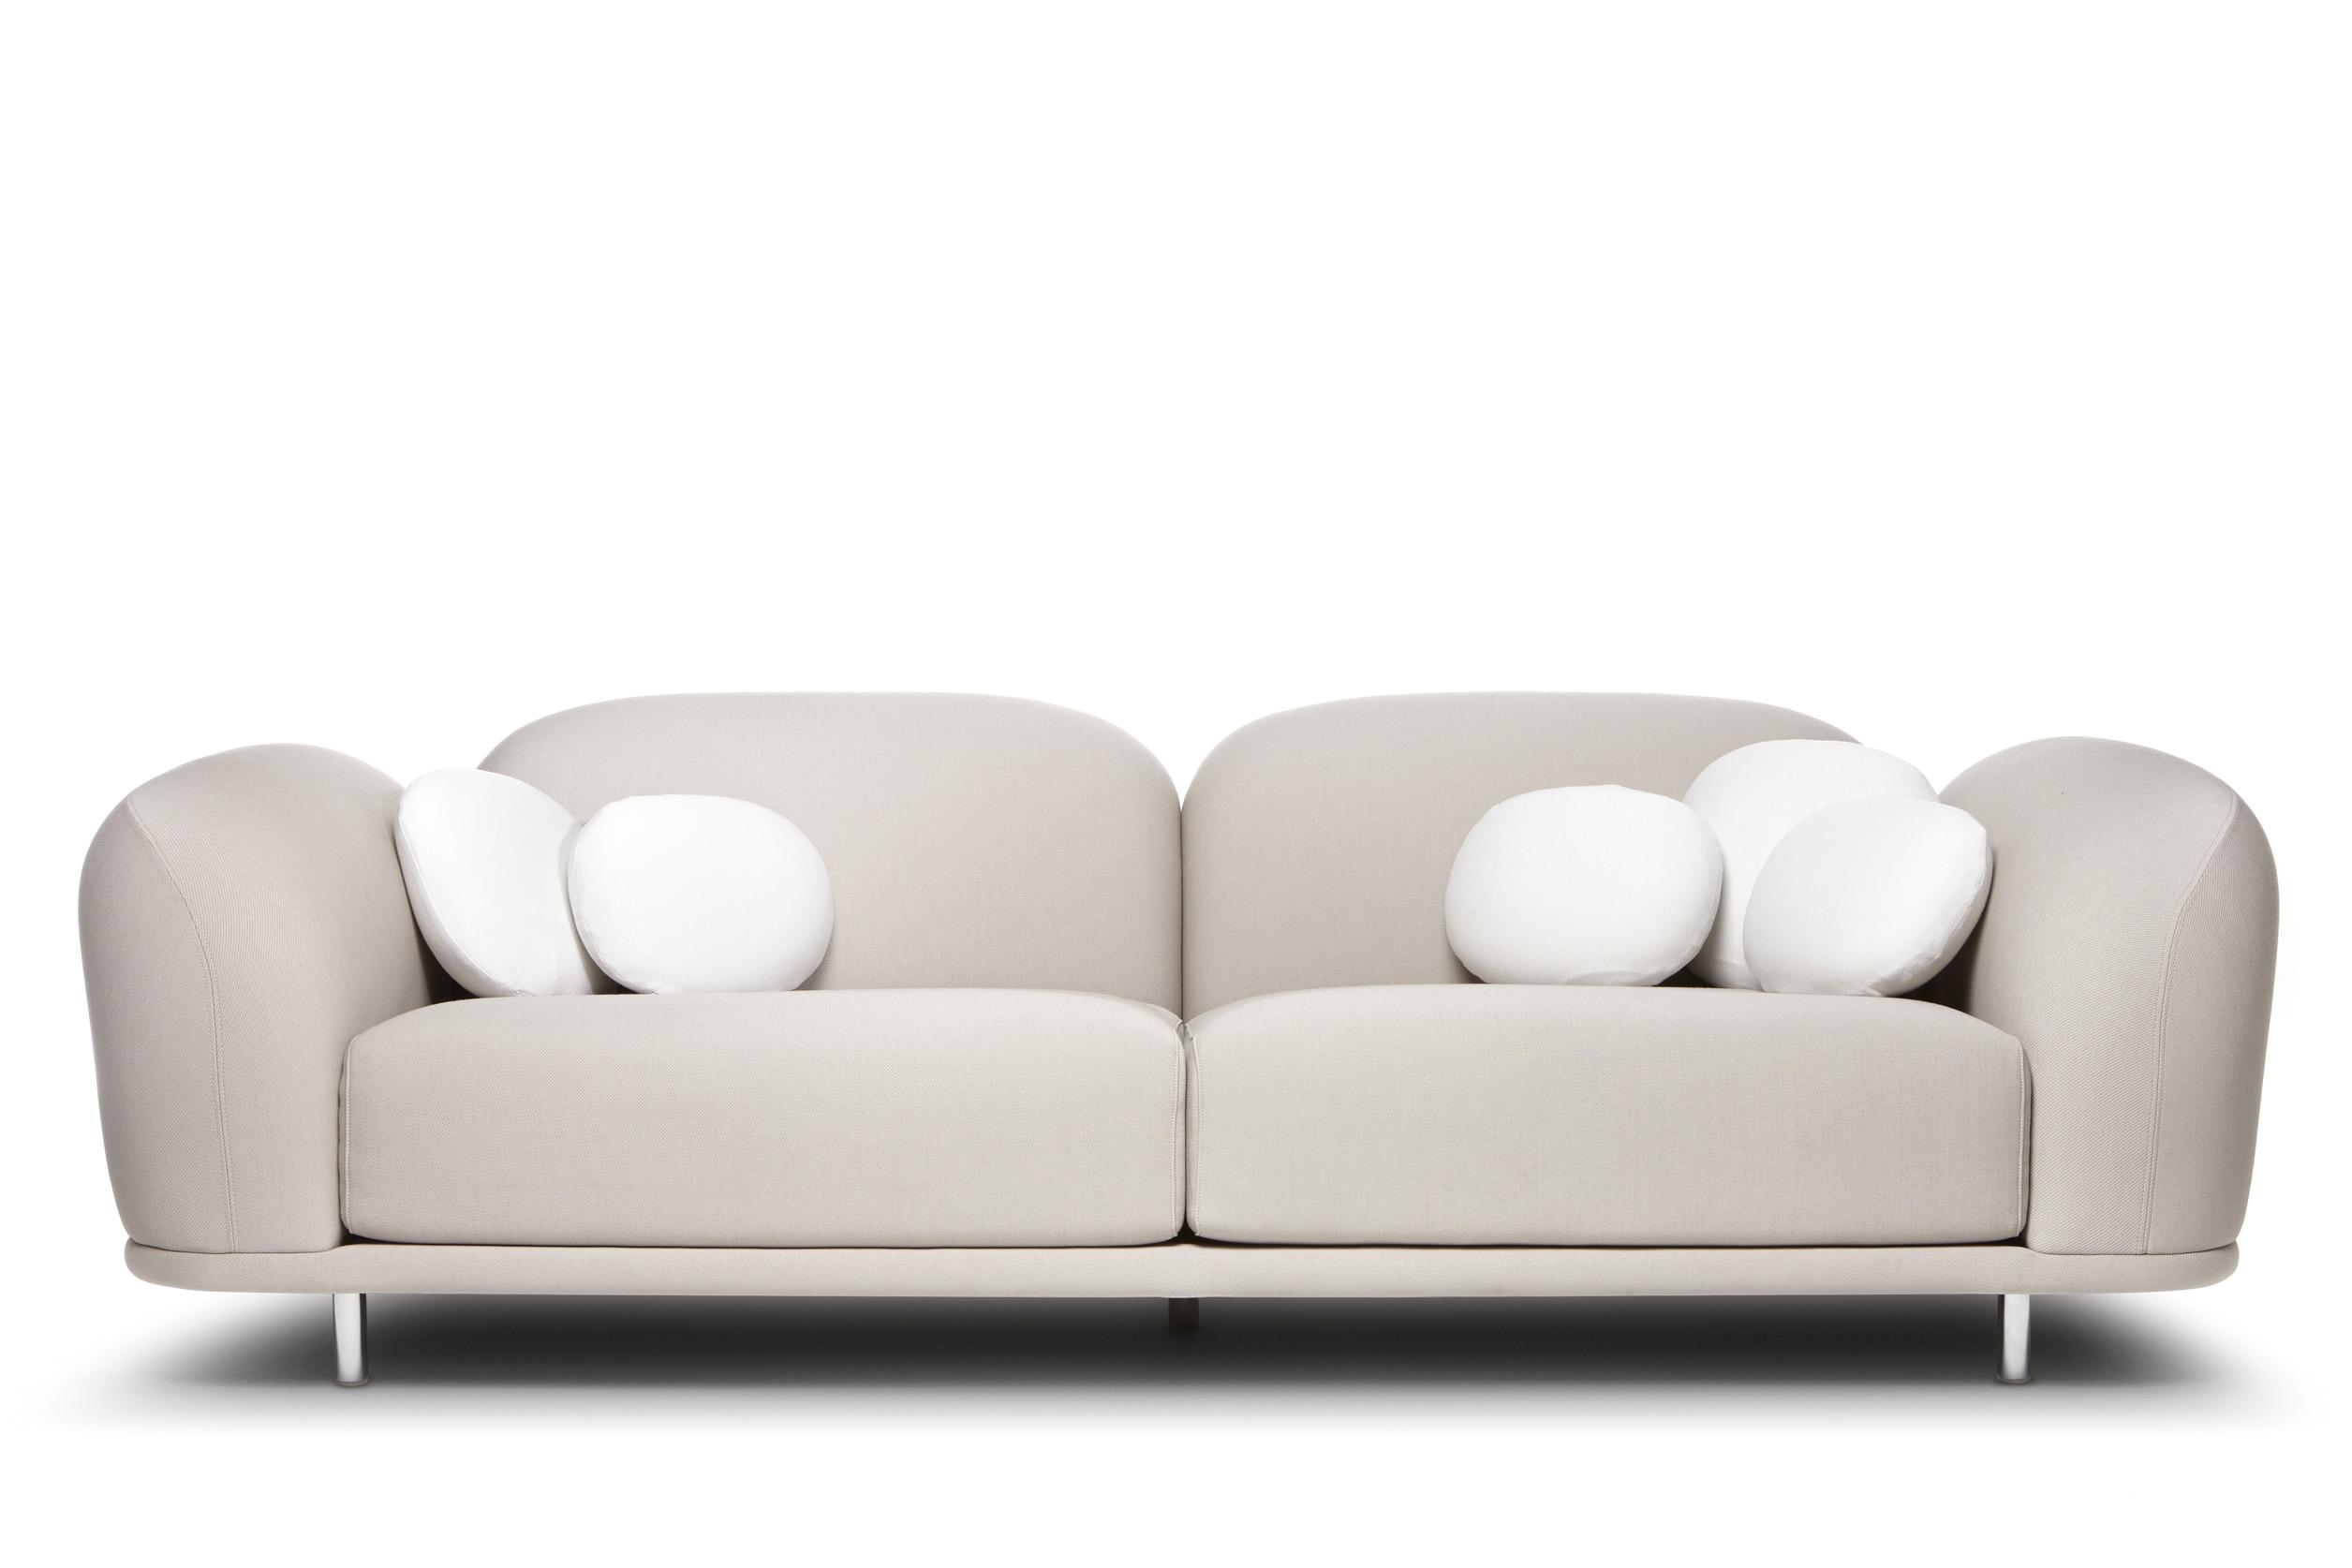 cloud sofa for sale best teak wood set designs moooi buy from campbell watson uk